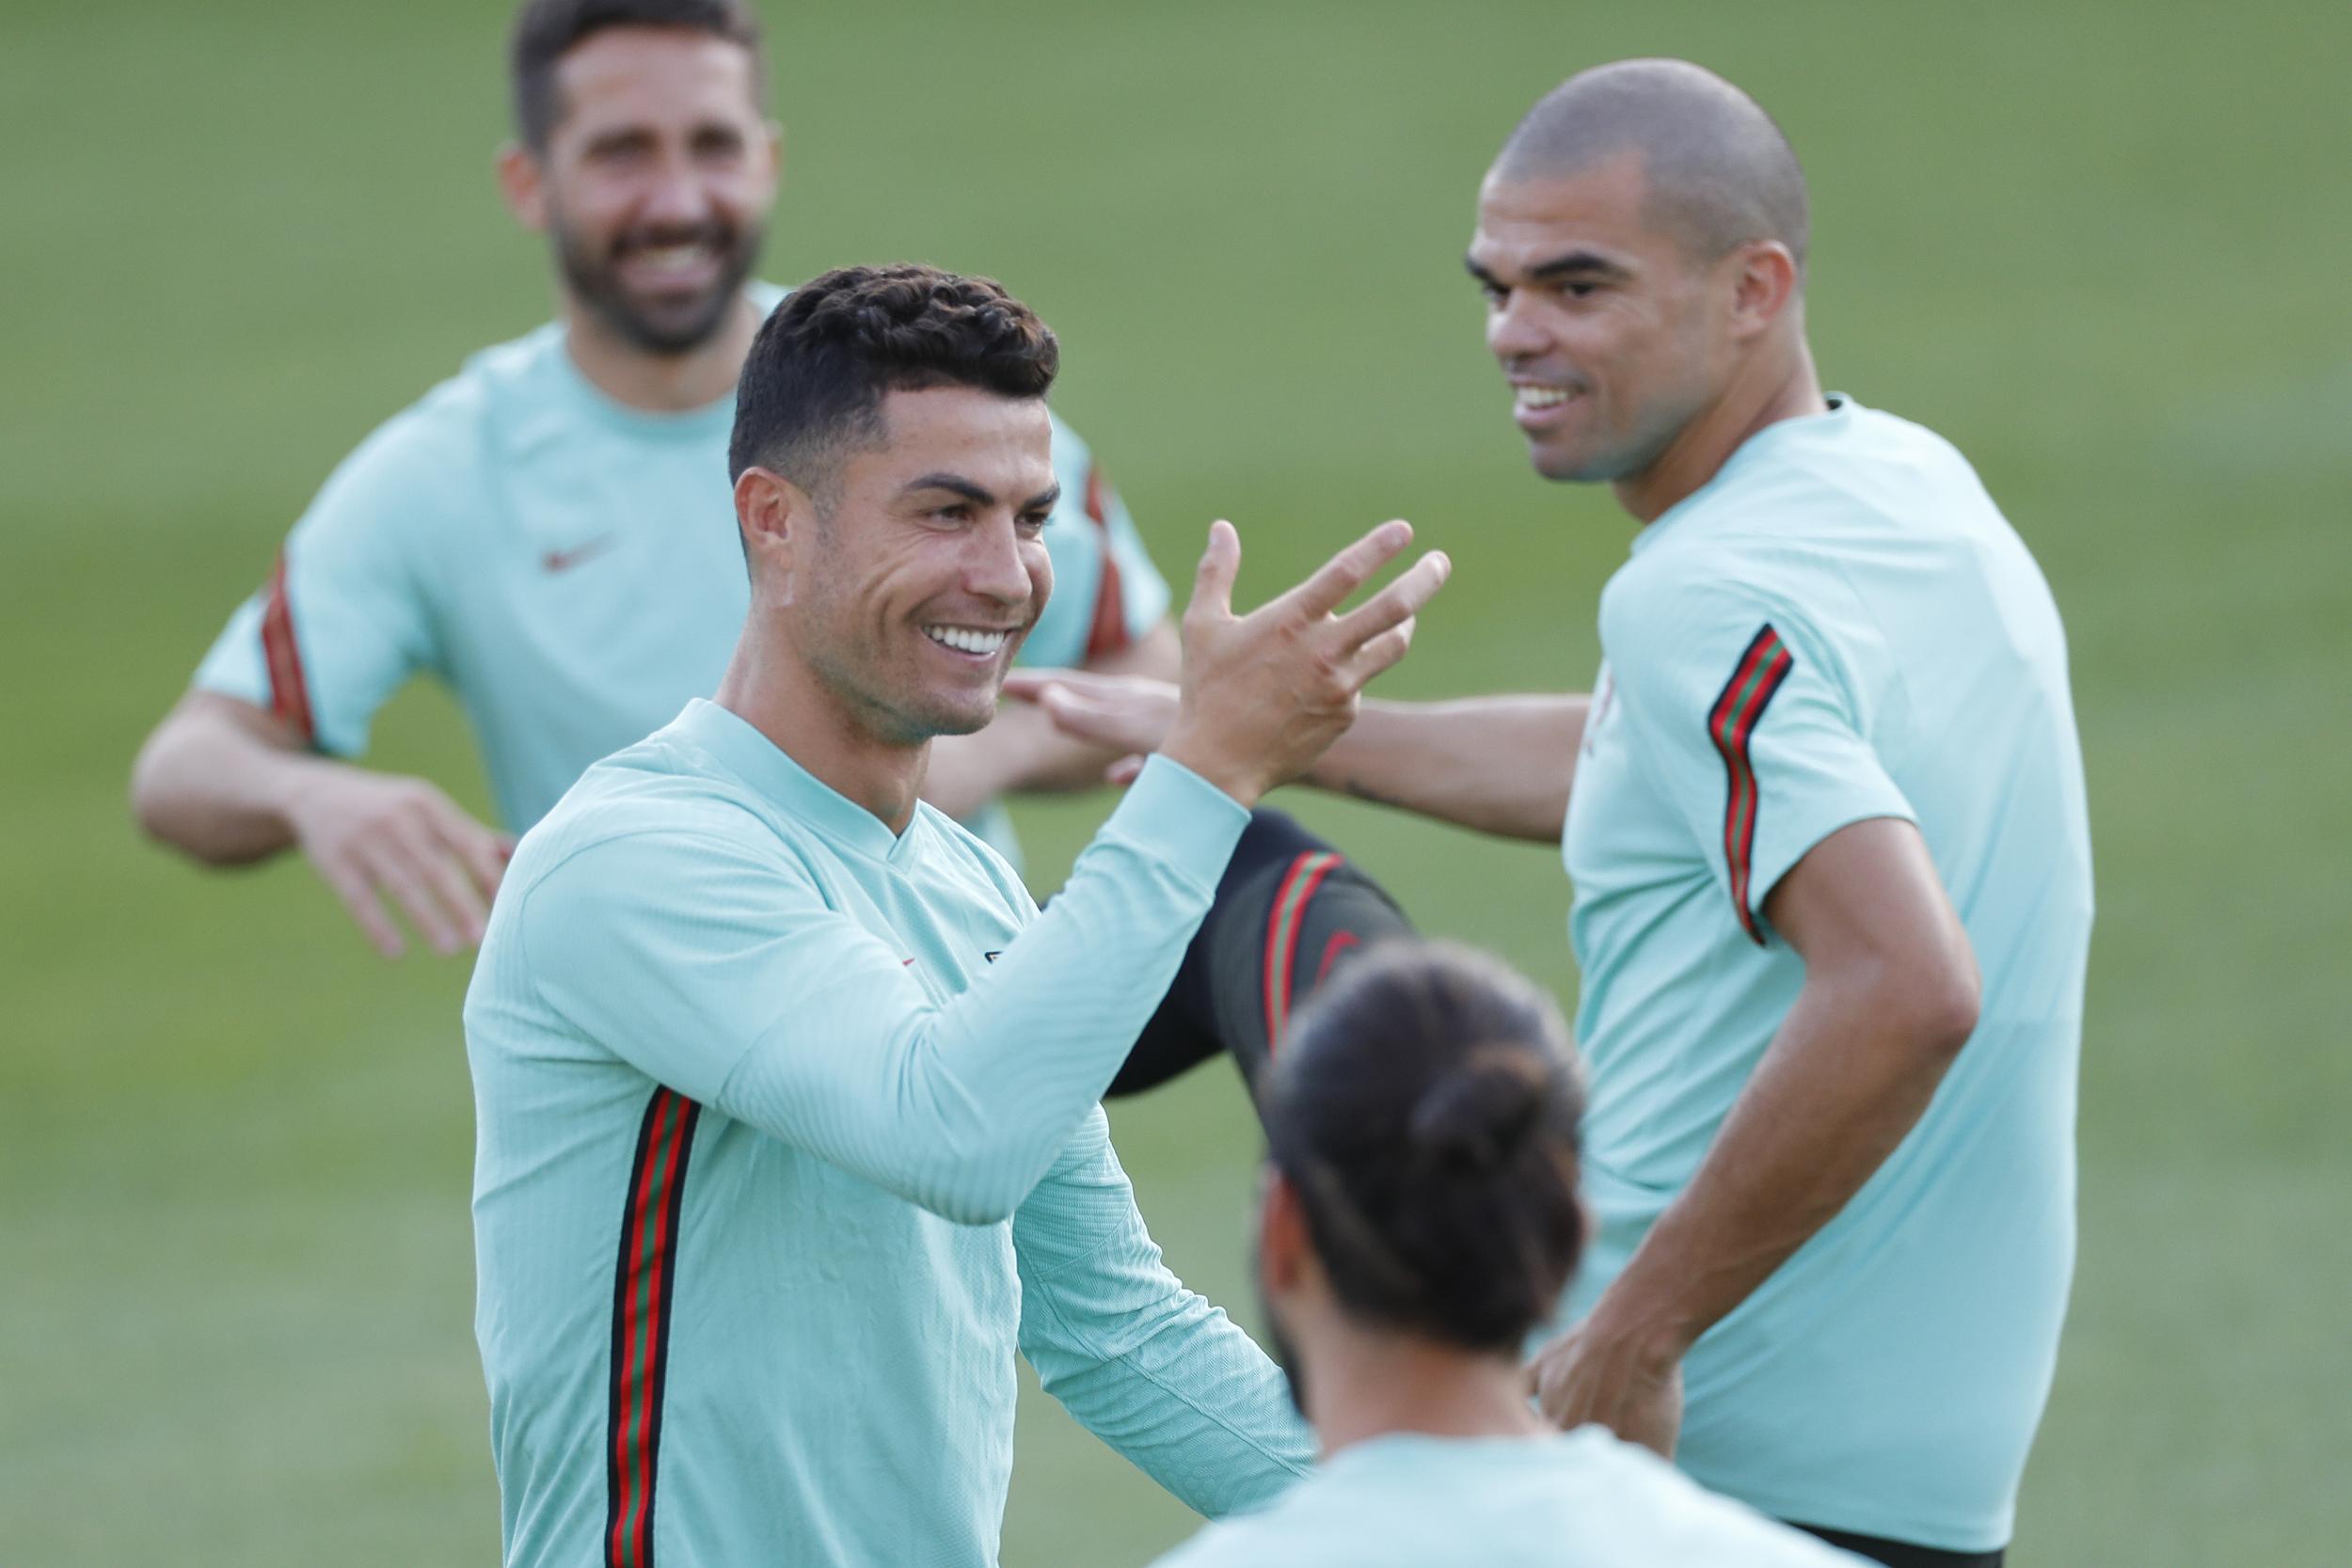 C罗和葡萄牙队能否保住小组出线权?